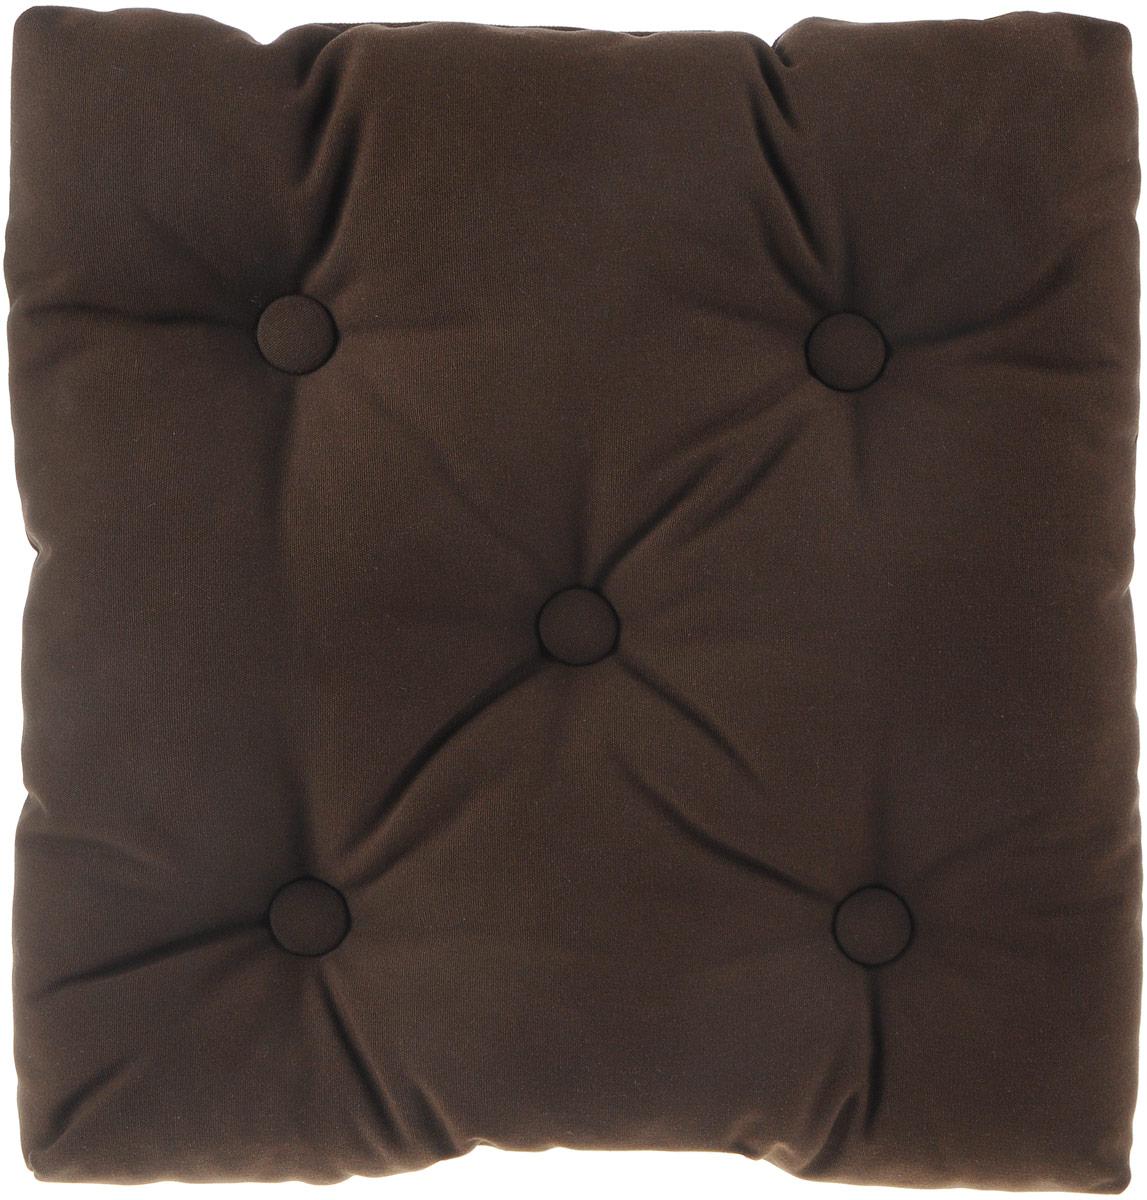 Подушка на стул KauffOrt Сад, цвет: коричневый, 40 x 40 см